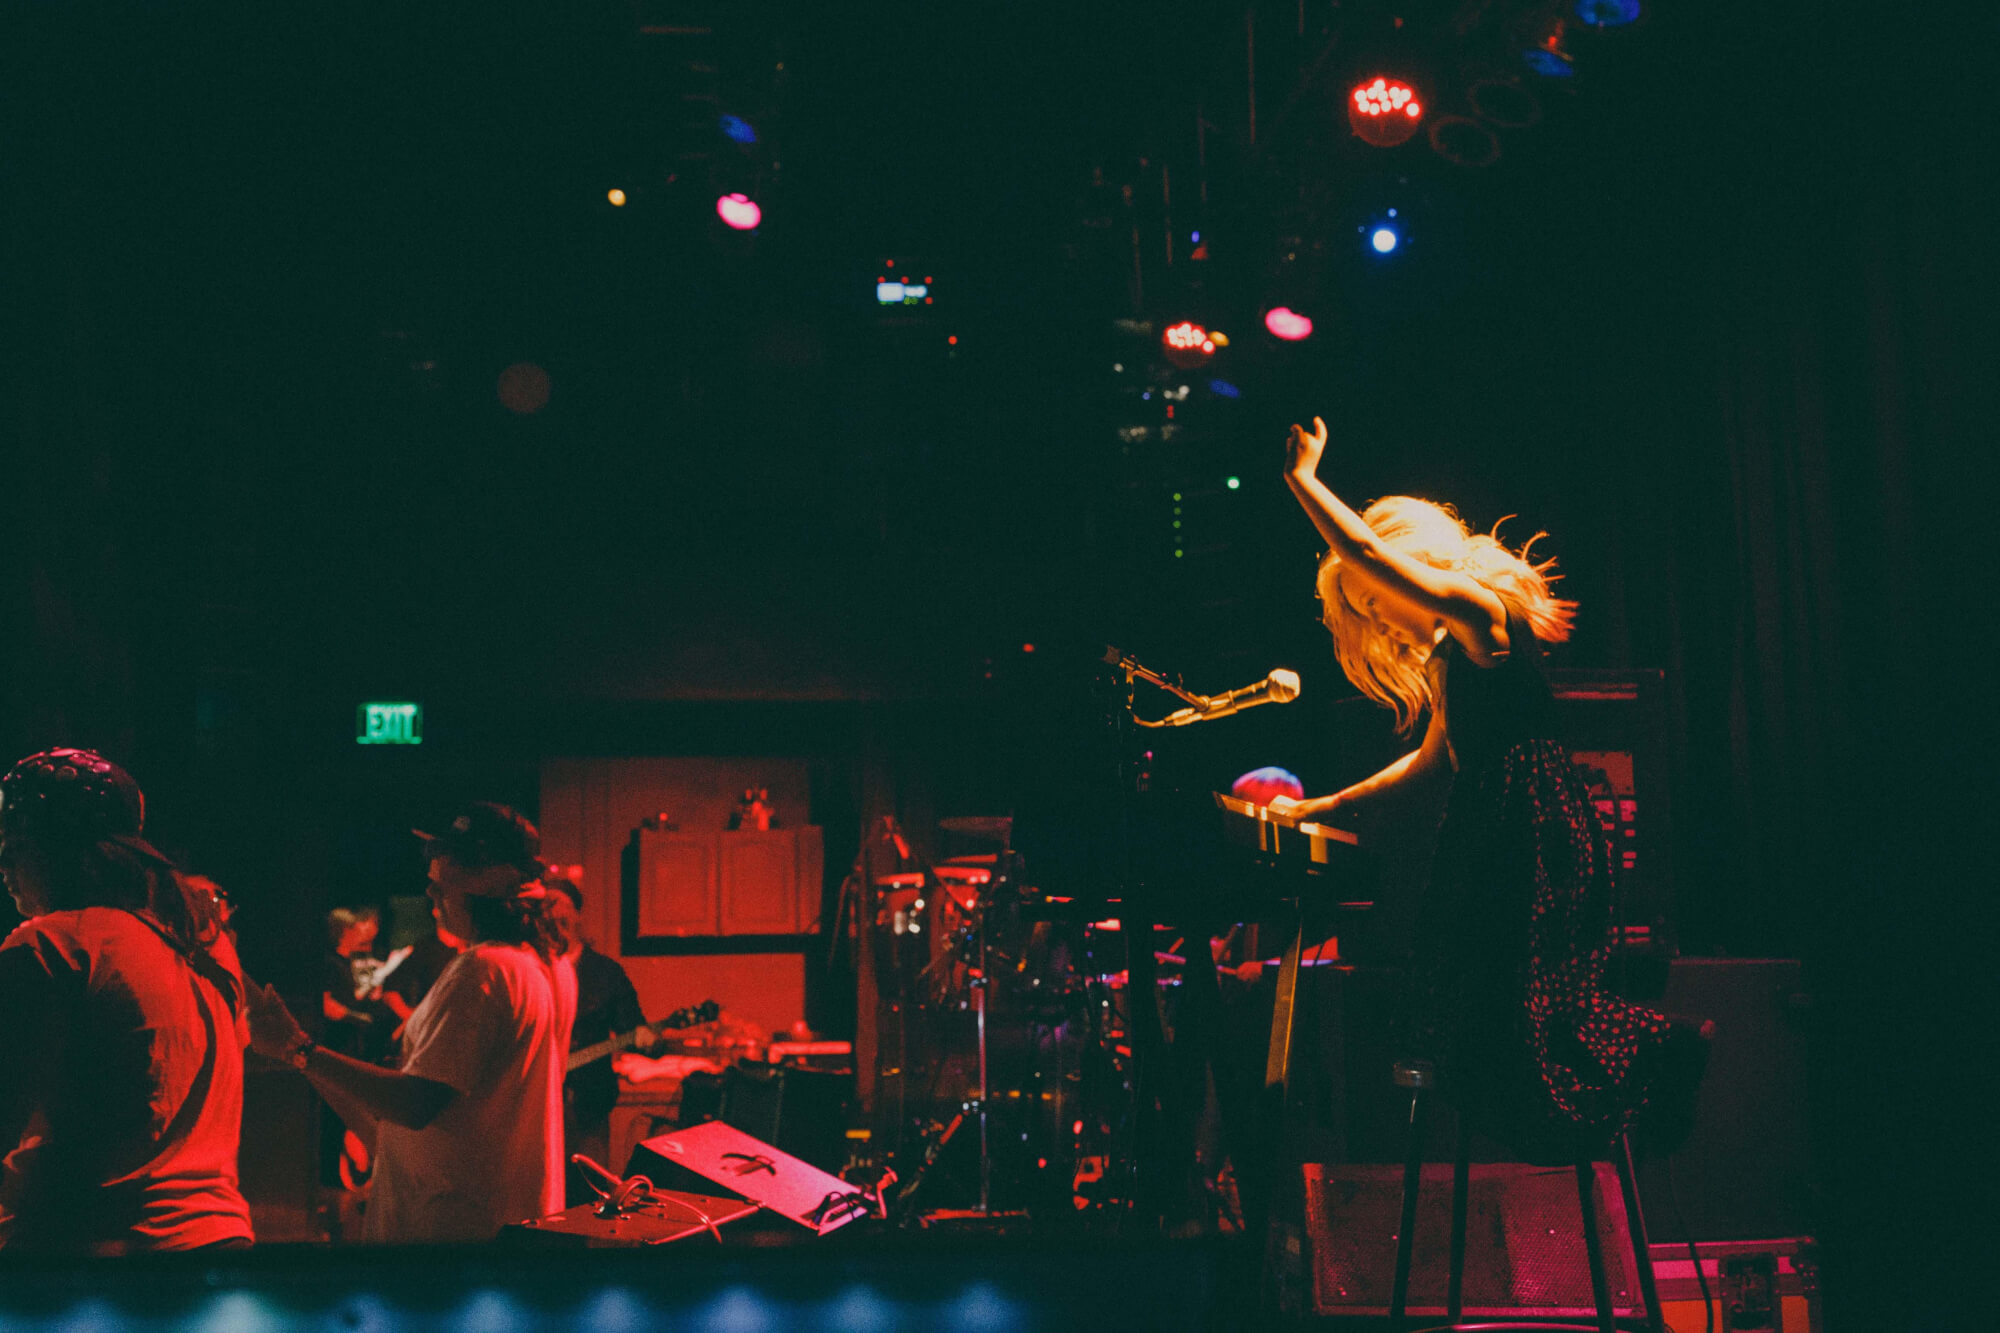 School of Rock Huntington Beach Performance Program rocking their Evolution of Punk show!